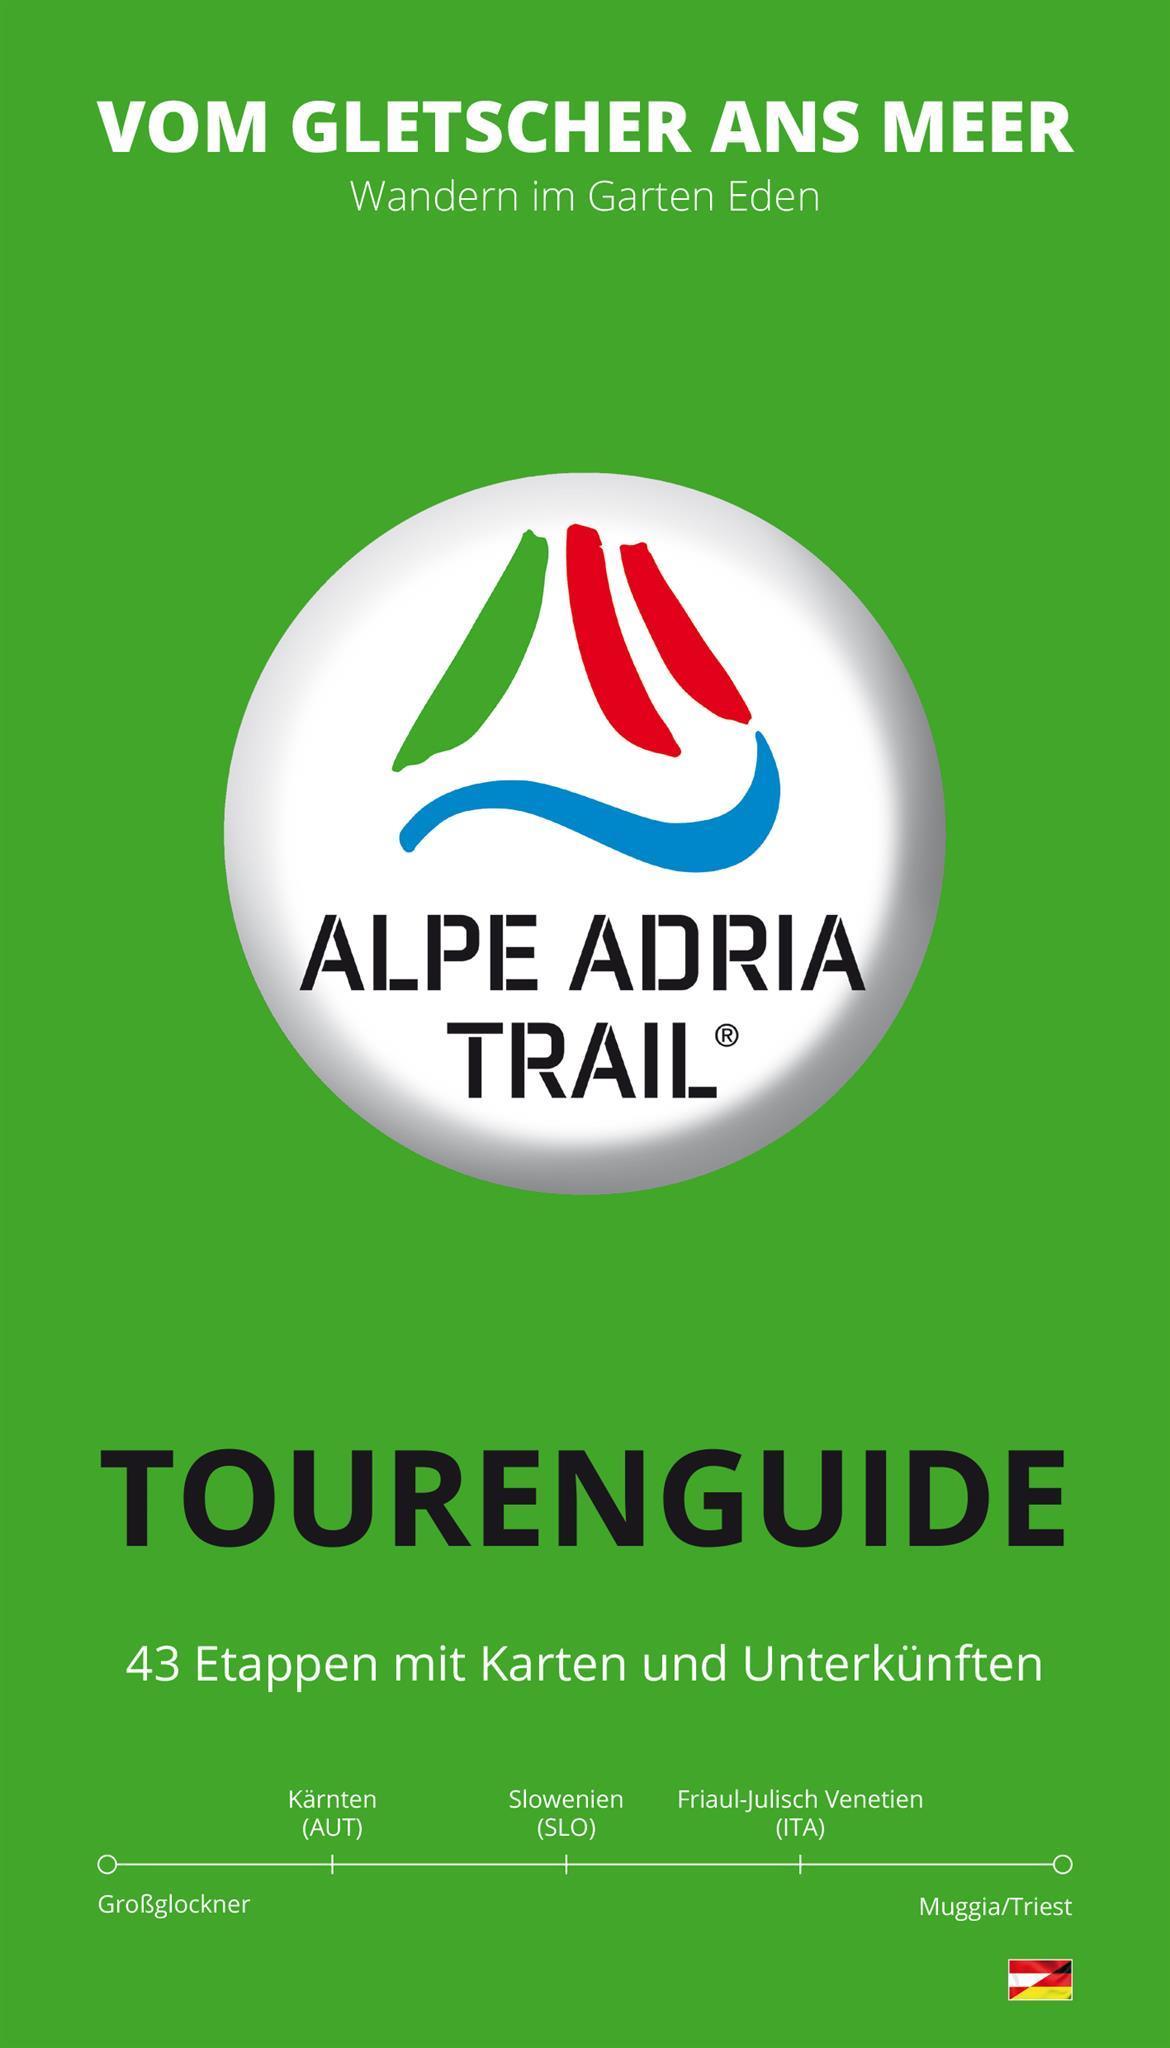 Alpe-Adria-Trail Tourenbuch(© Alpe Adria Trail)